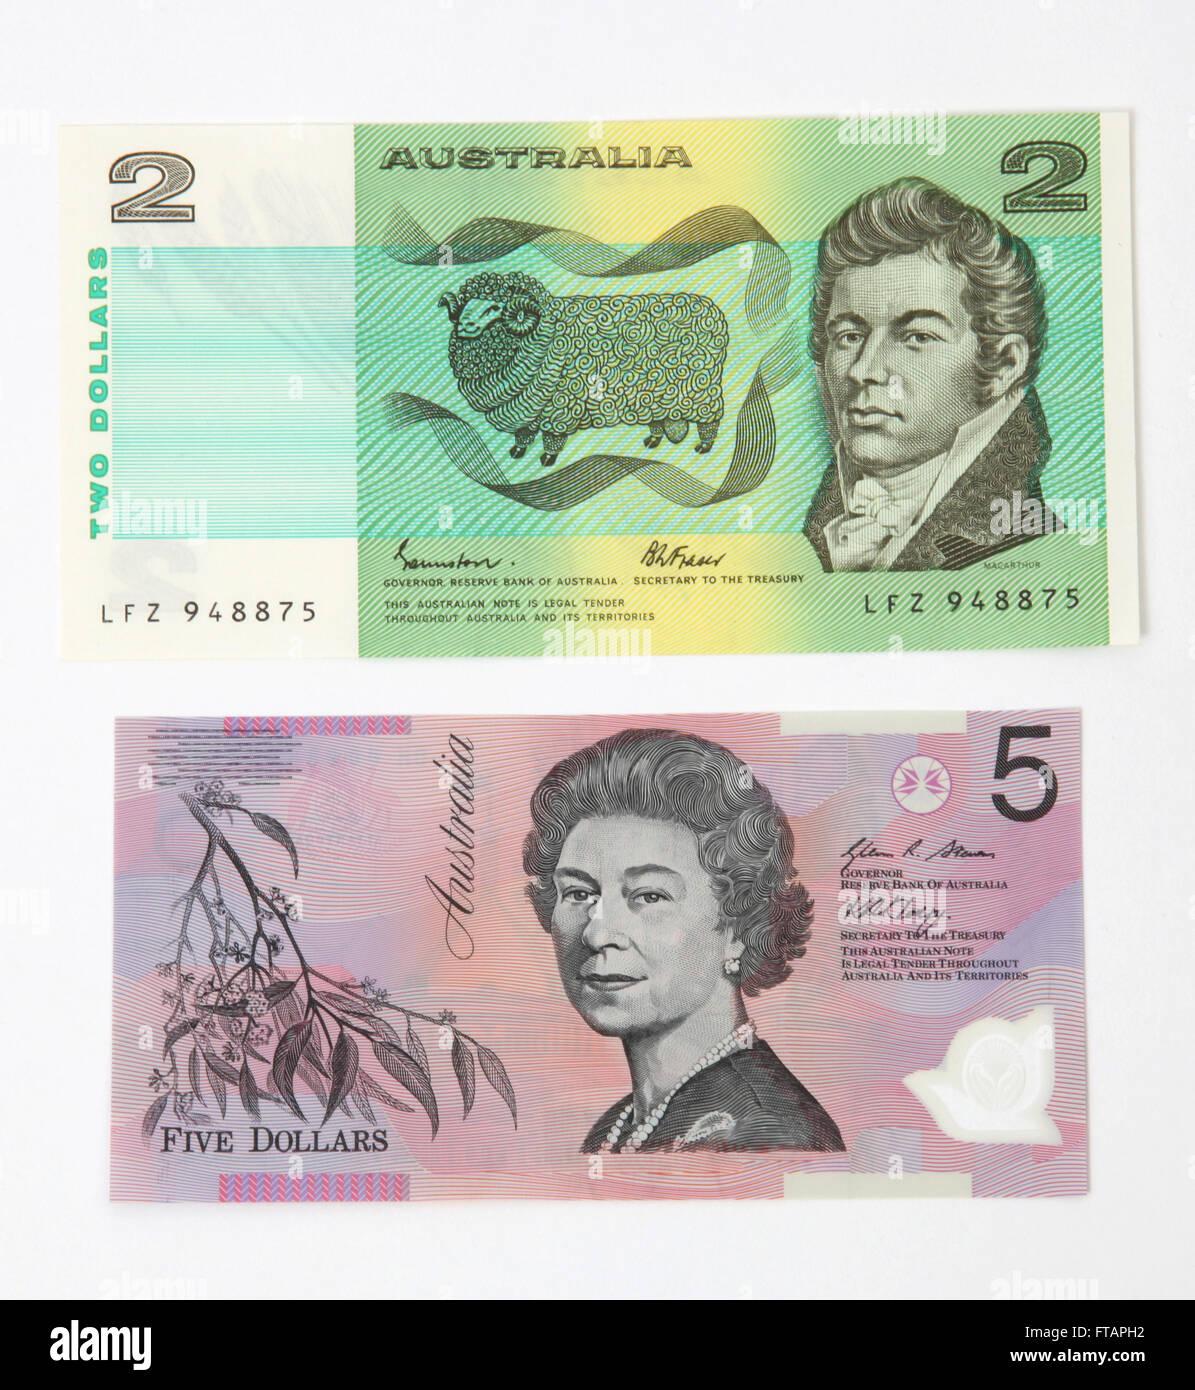 Un billet de banque de deux dollars et un billet de banque de cinq dollars. Photo Stock